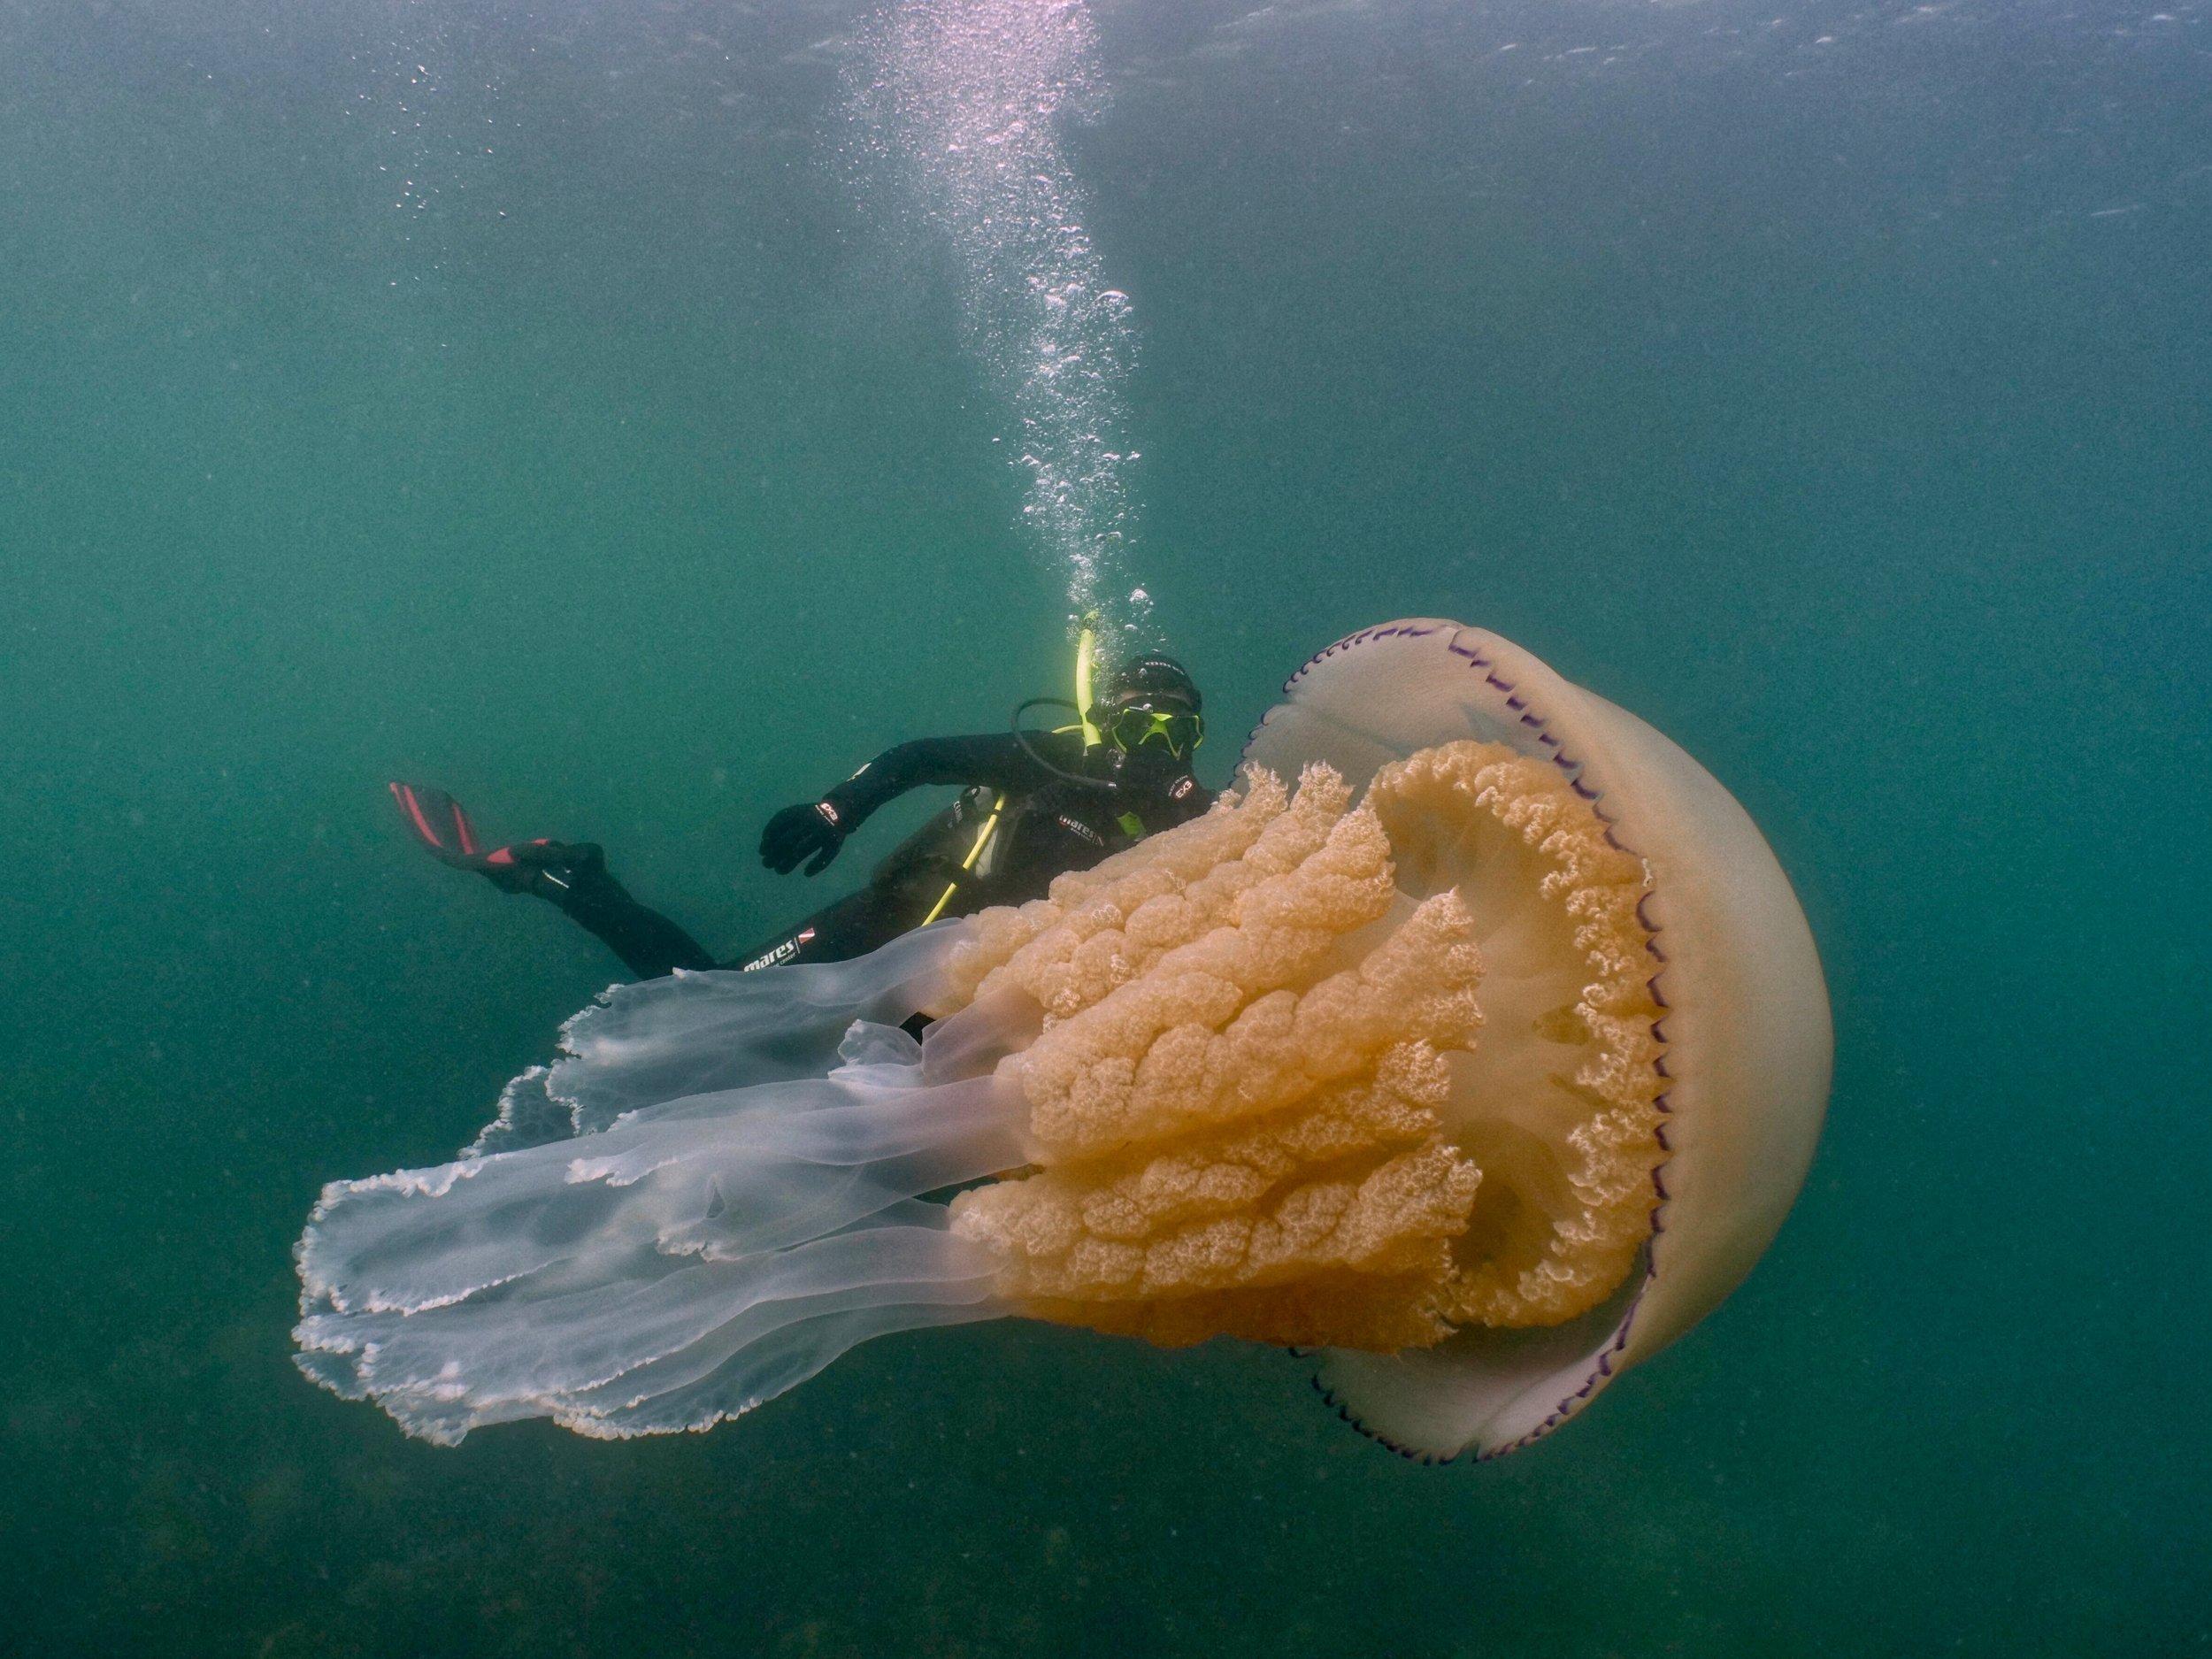 Jellyfish lizzie Daly copyright is Dan Abbott.jpg